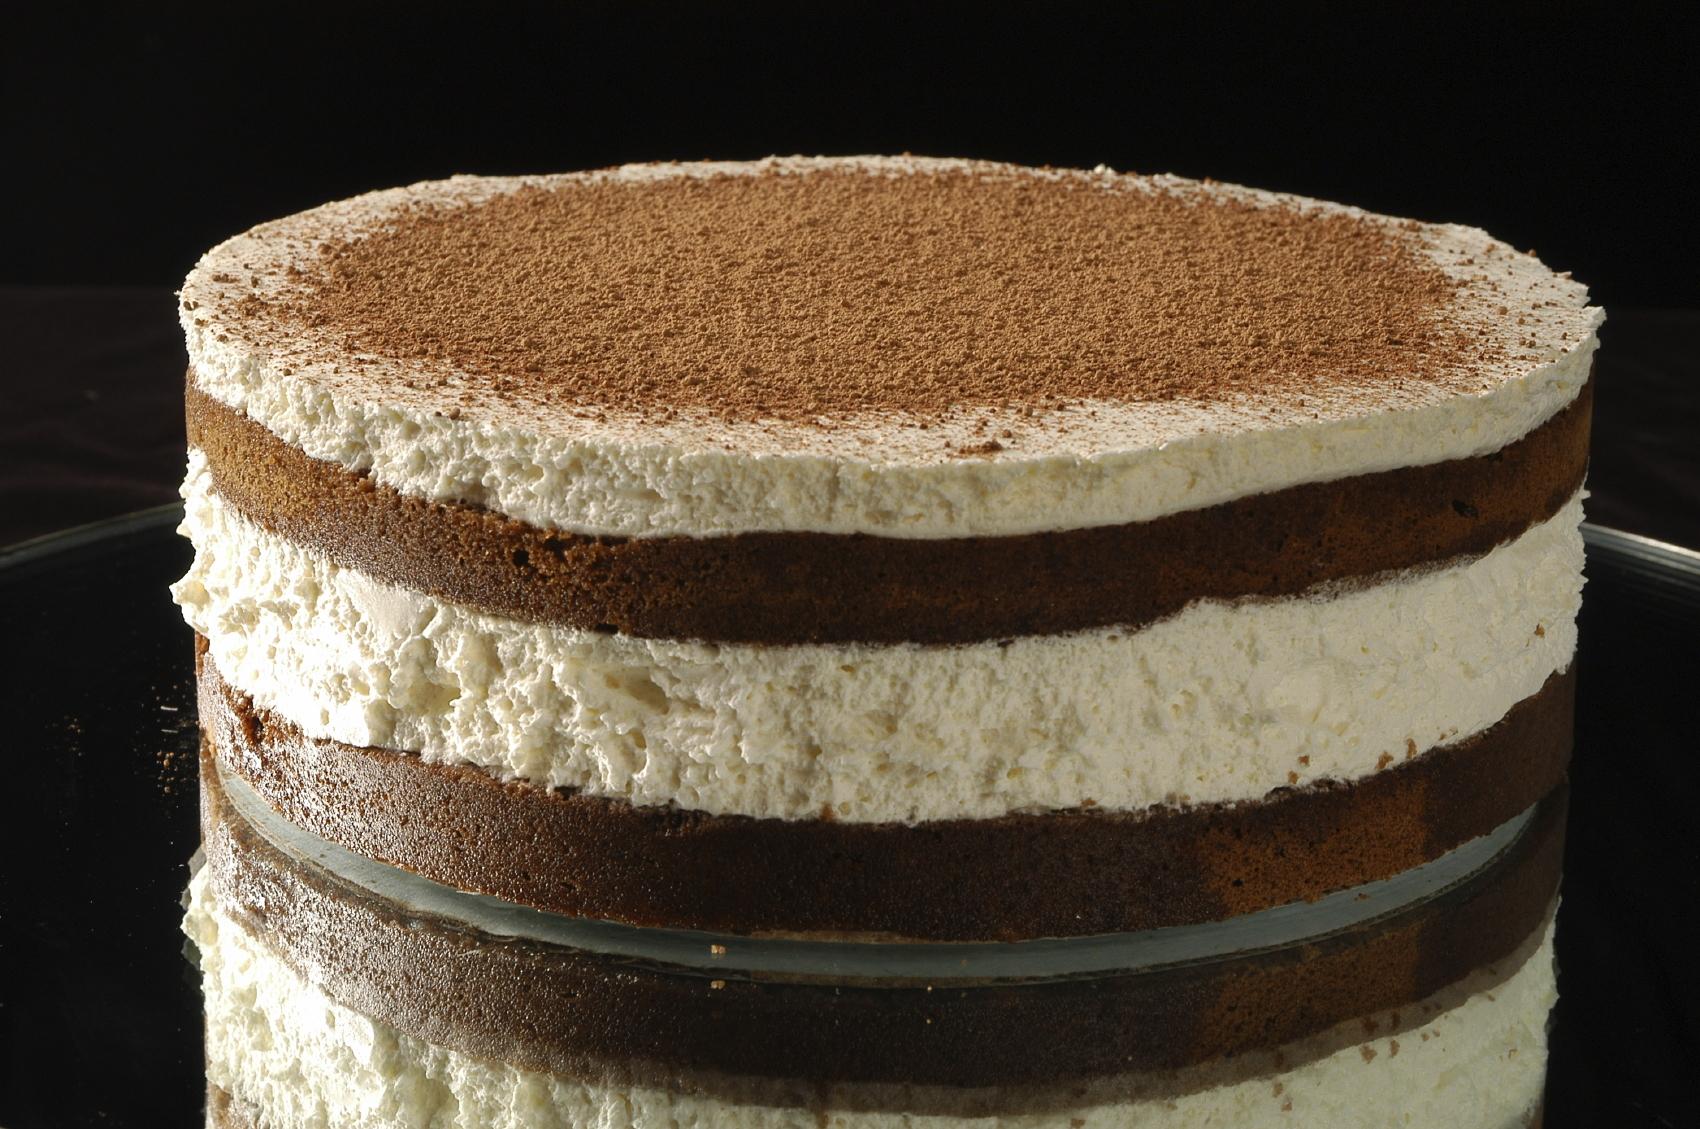 Torta de chocolate y merengue